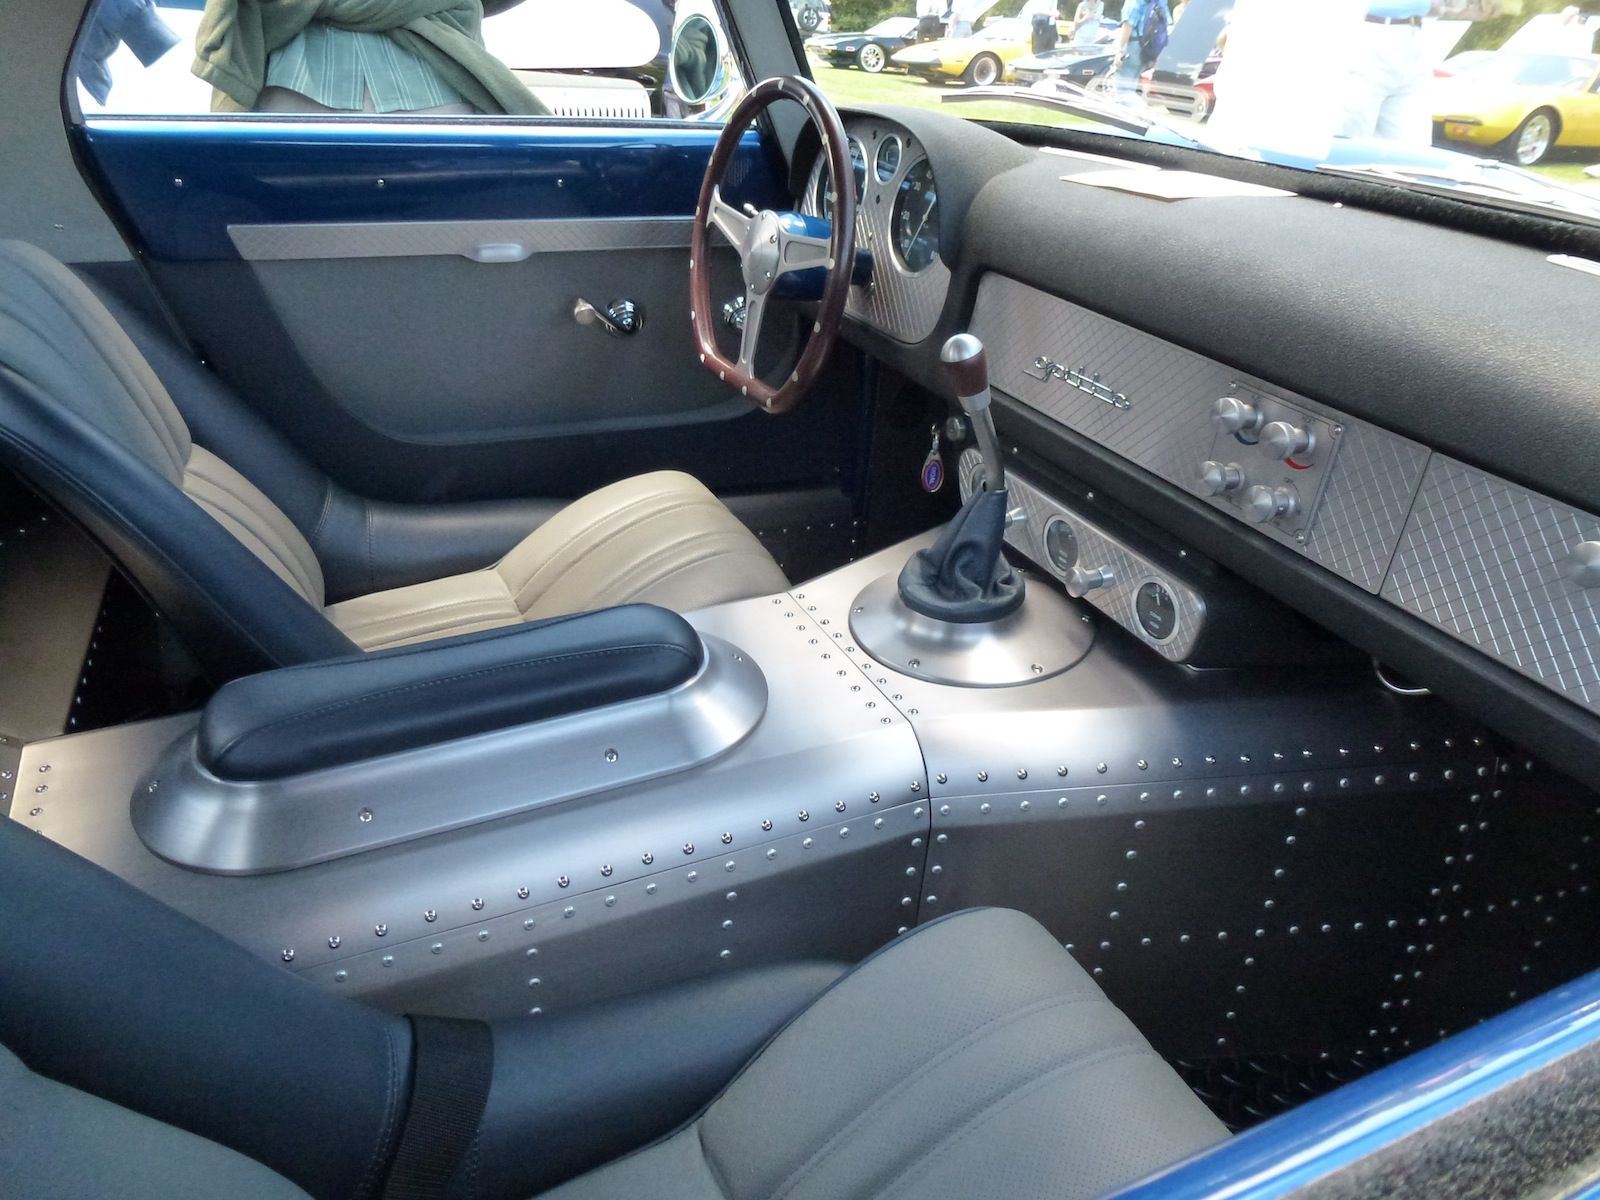 P1030465 Jpg 1600 1200 Custom Car Interior Custom Cars Car Interior